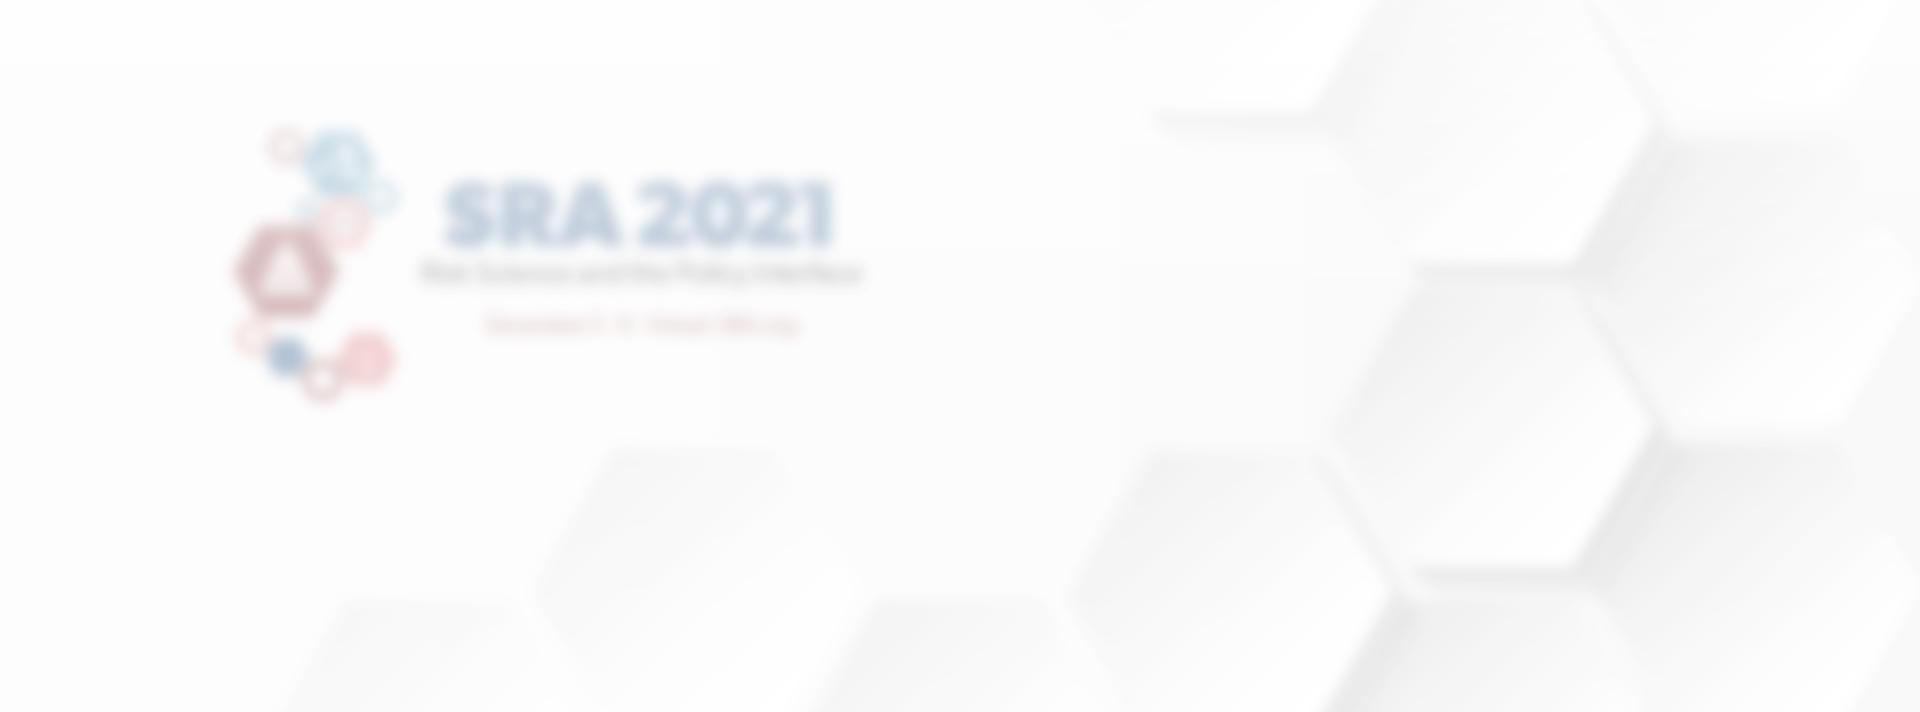 Sra000 2021annualmtg Background2